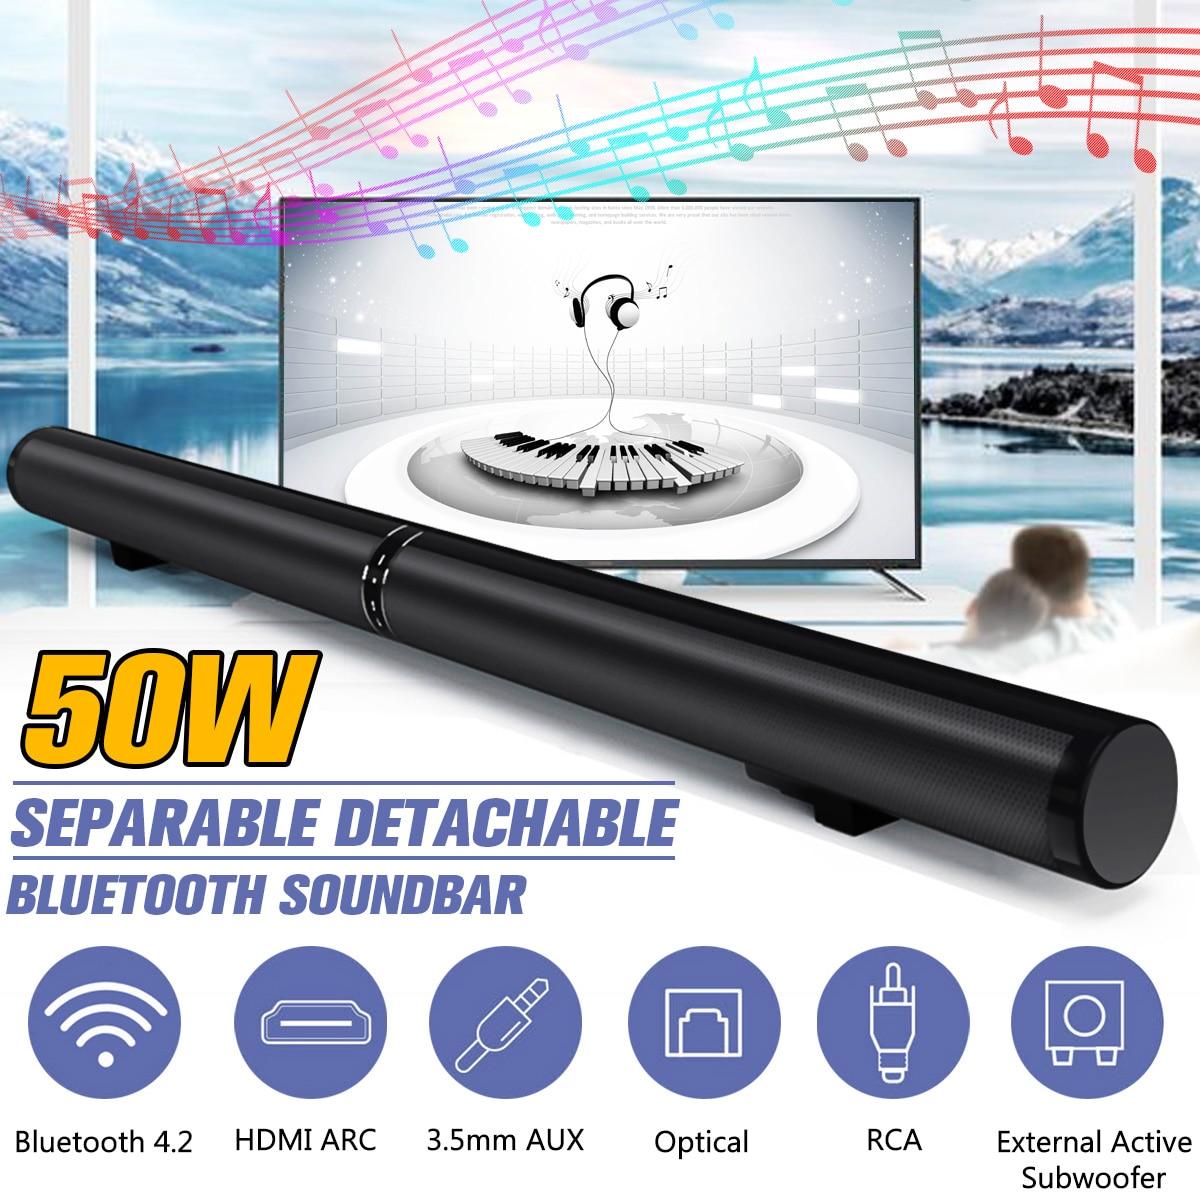 50W HiFi Detachable Wireless Bluetooth Soundbar Speaker 3D Surround Stereo Subwoofer for TV Home Theatre System Sound Bar цена